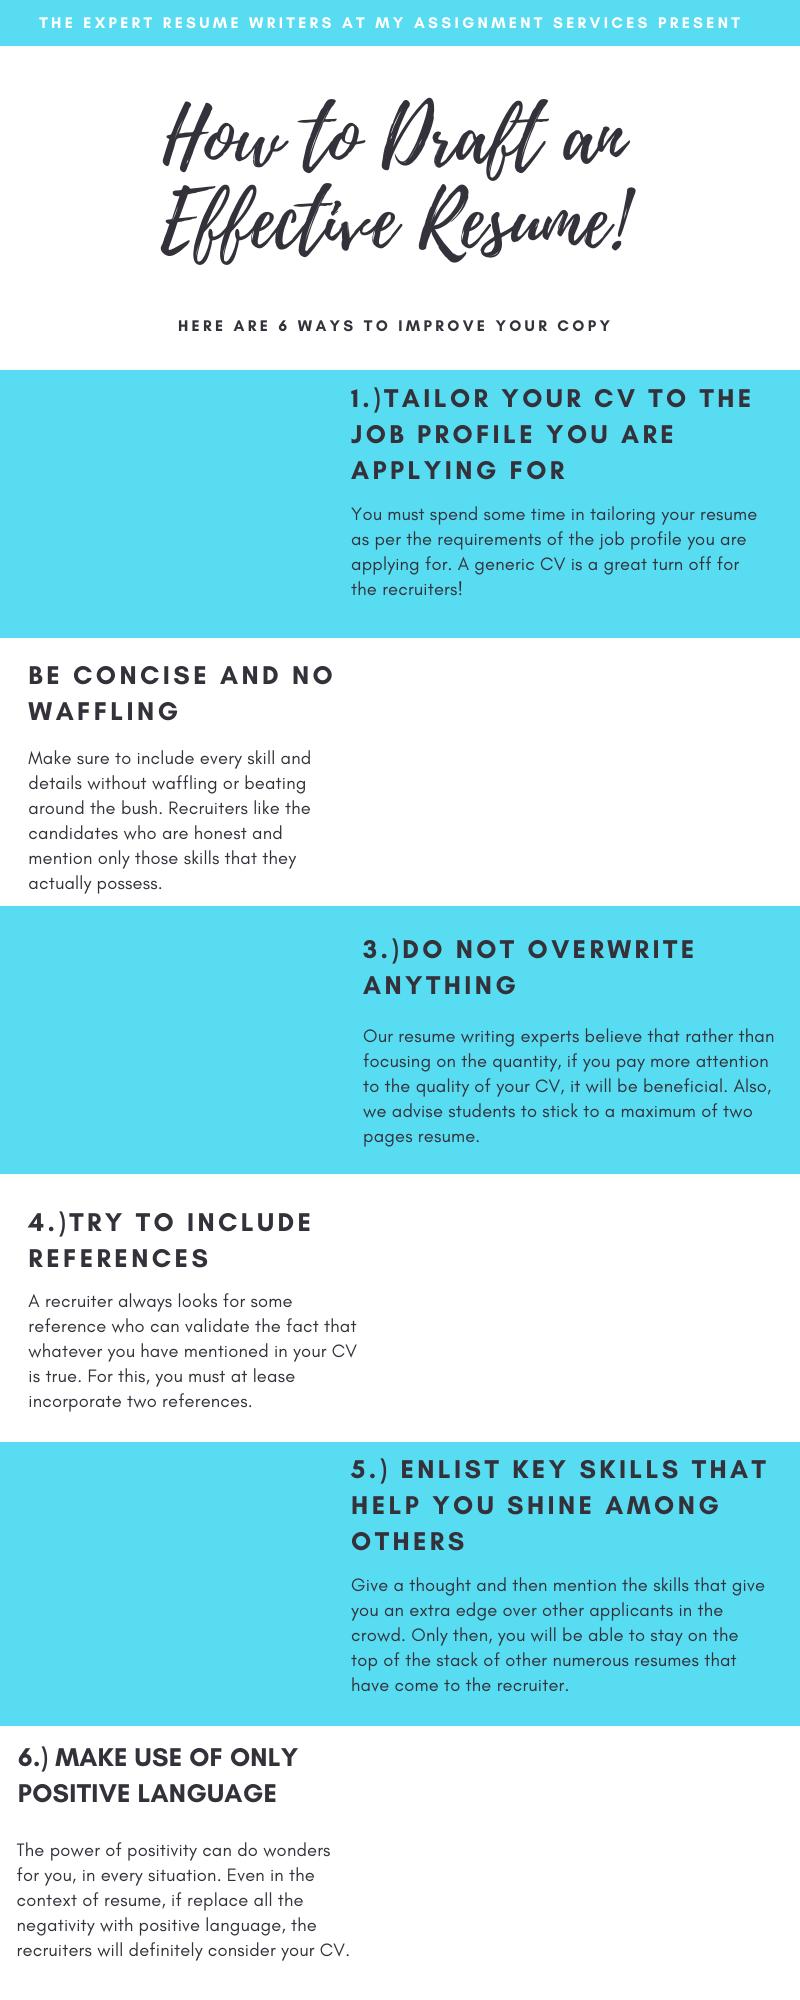 6 tips for an effective CV